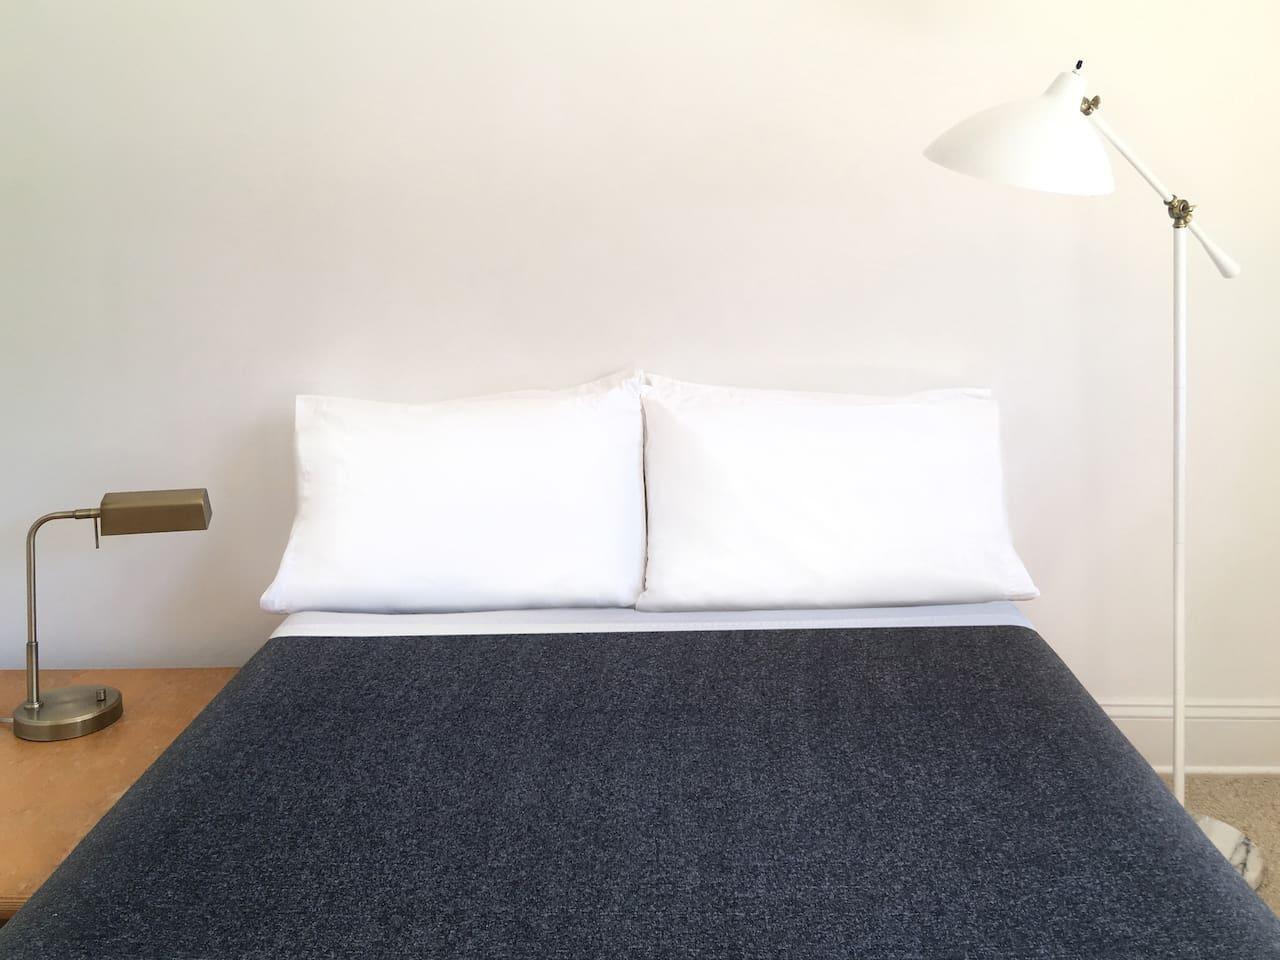 Platform bed with memory foam mattress